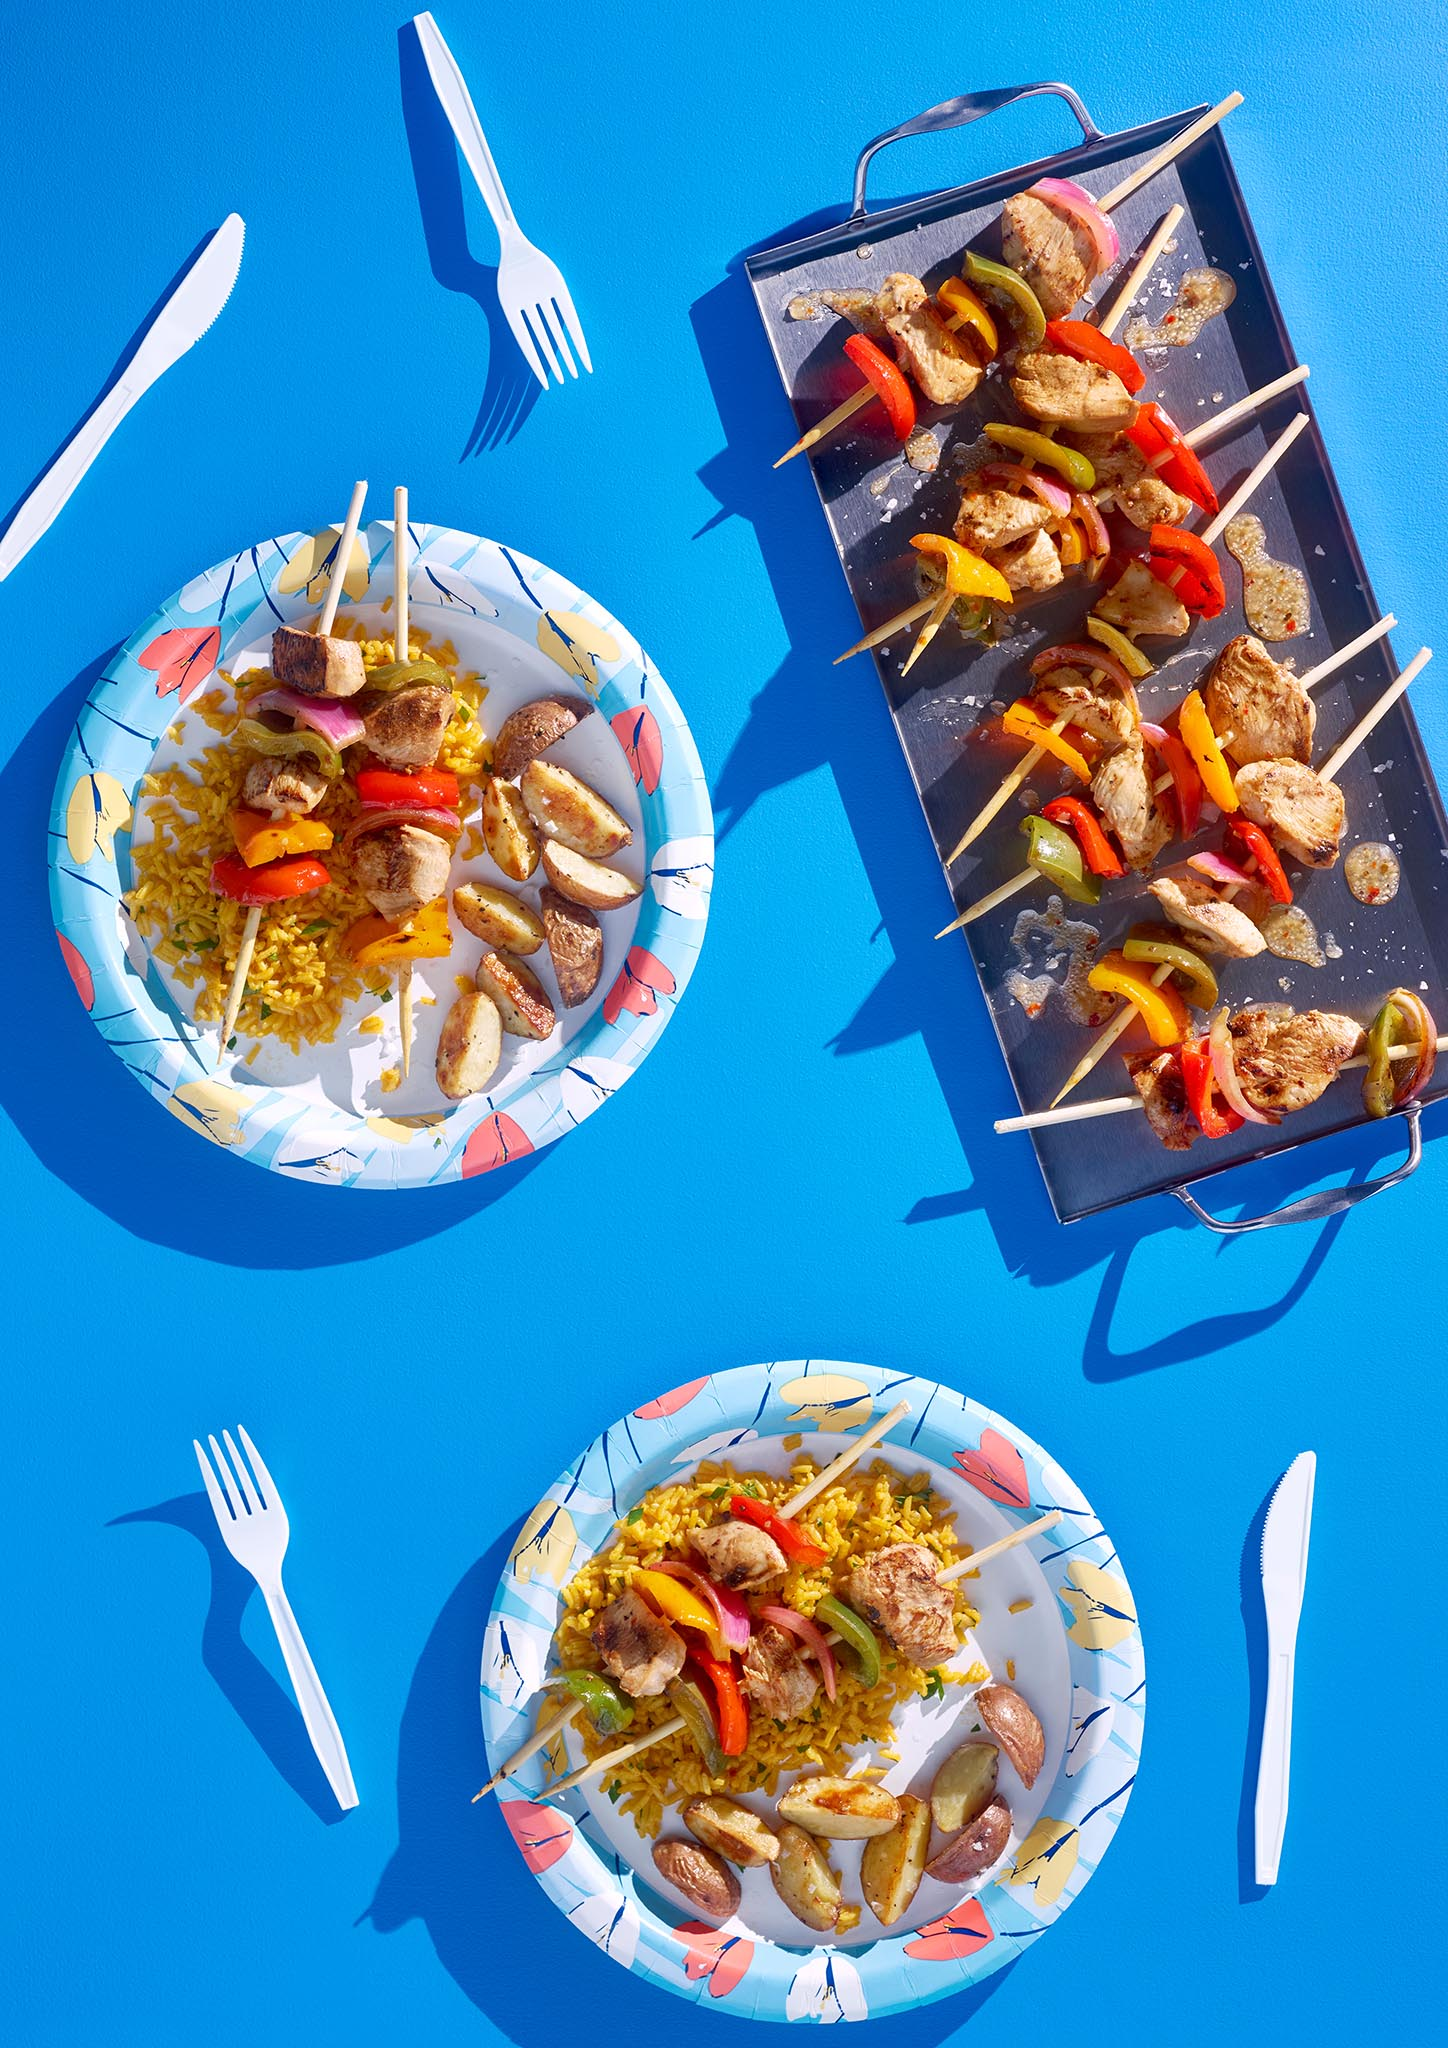 Huhtamaki_Tulips-Plates-White-Cutlery.jpg